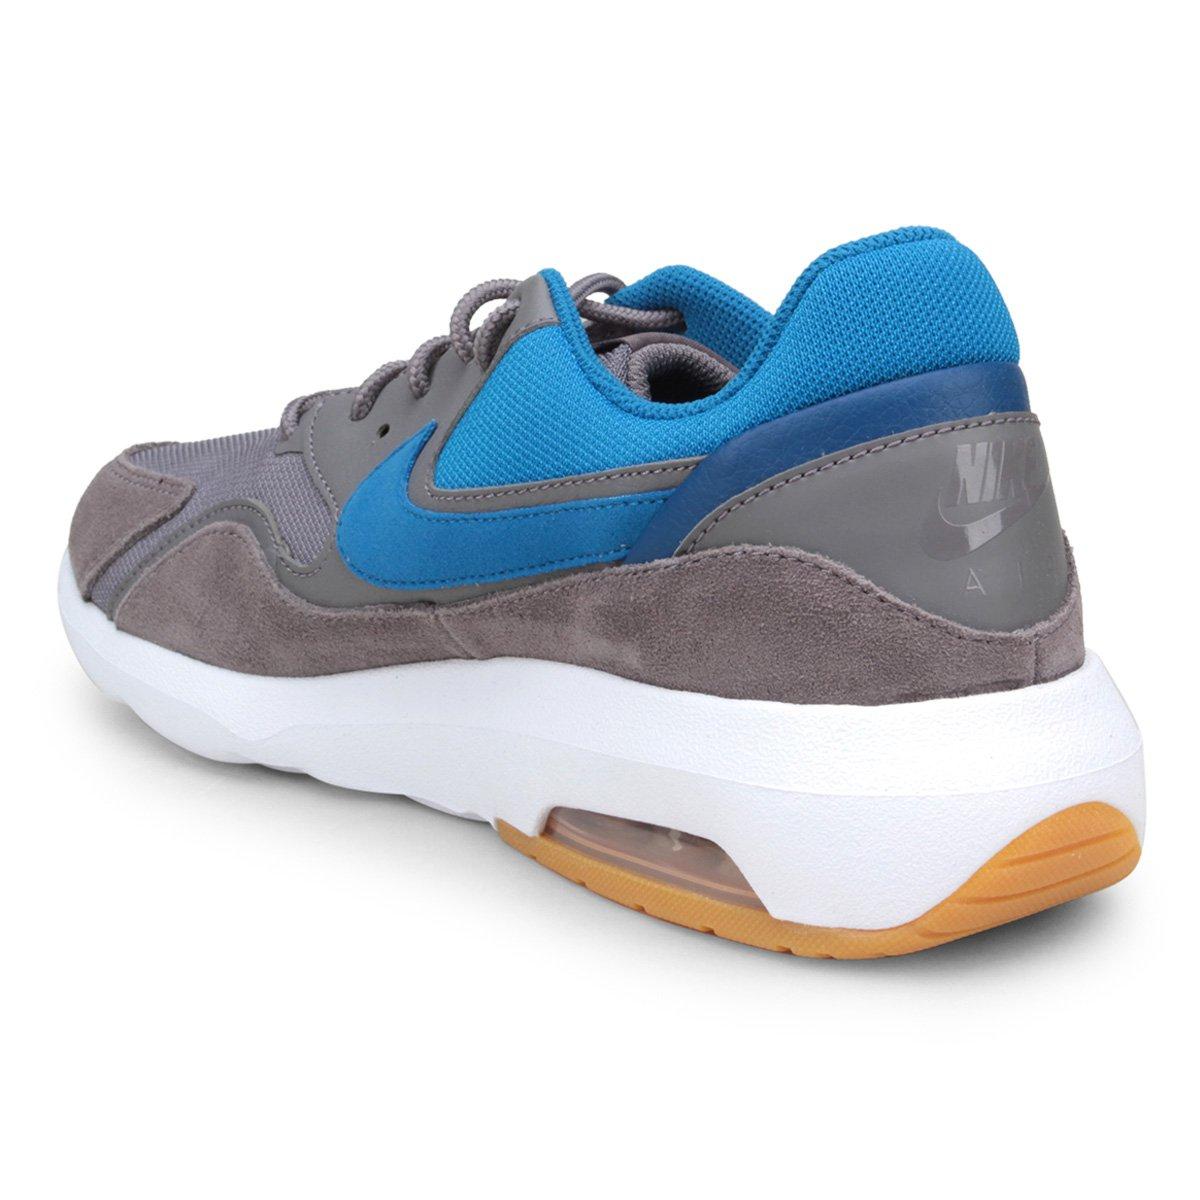 dfd5a0a129b Azul Tênis Nostalgic Tênis Nike Air Max Nike Masculino 0wqXT5g for ...